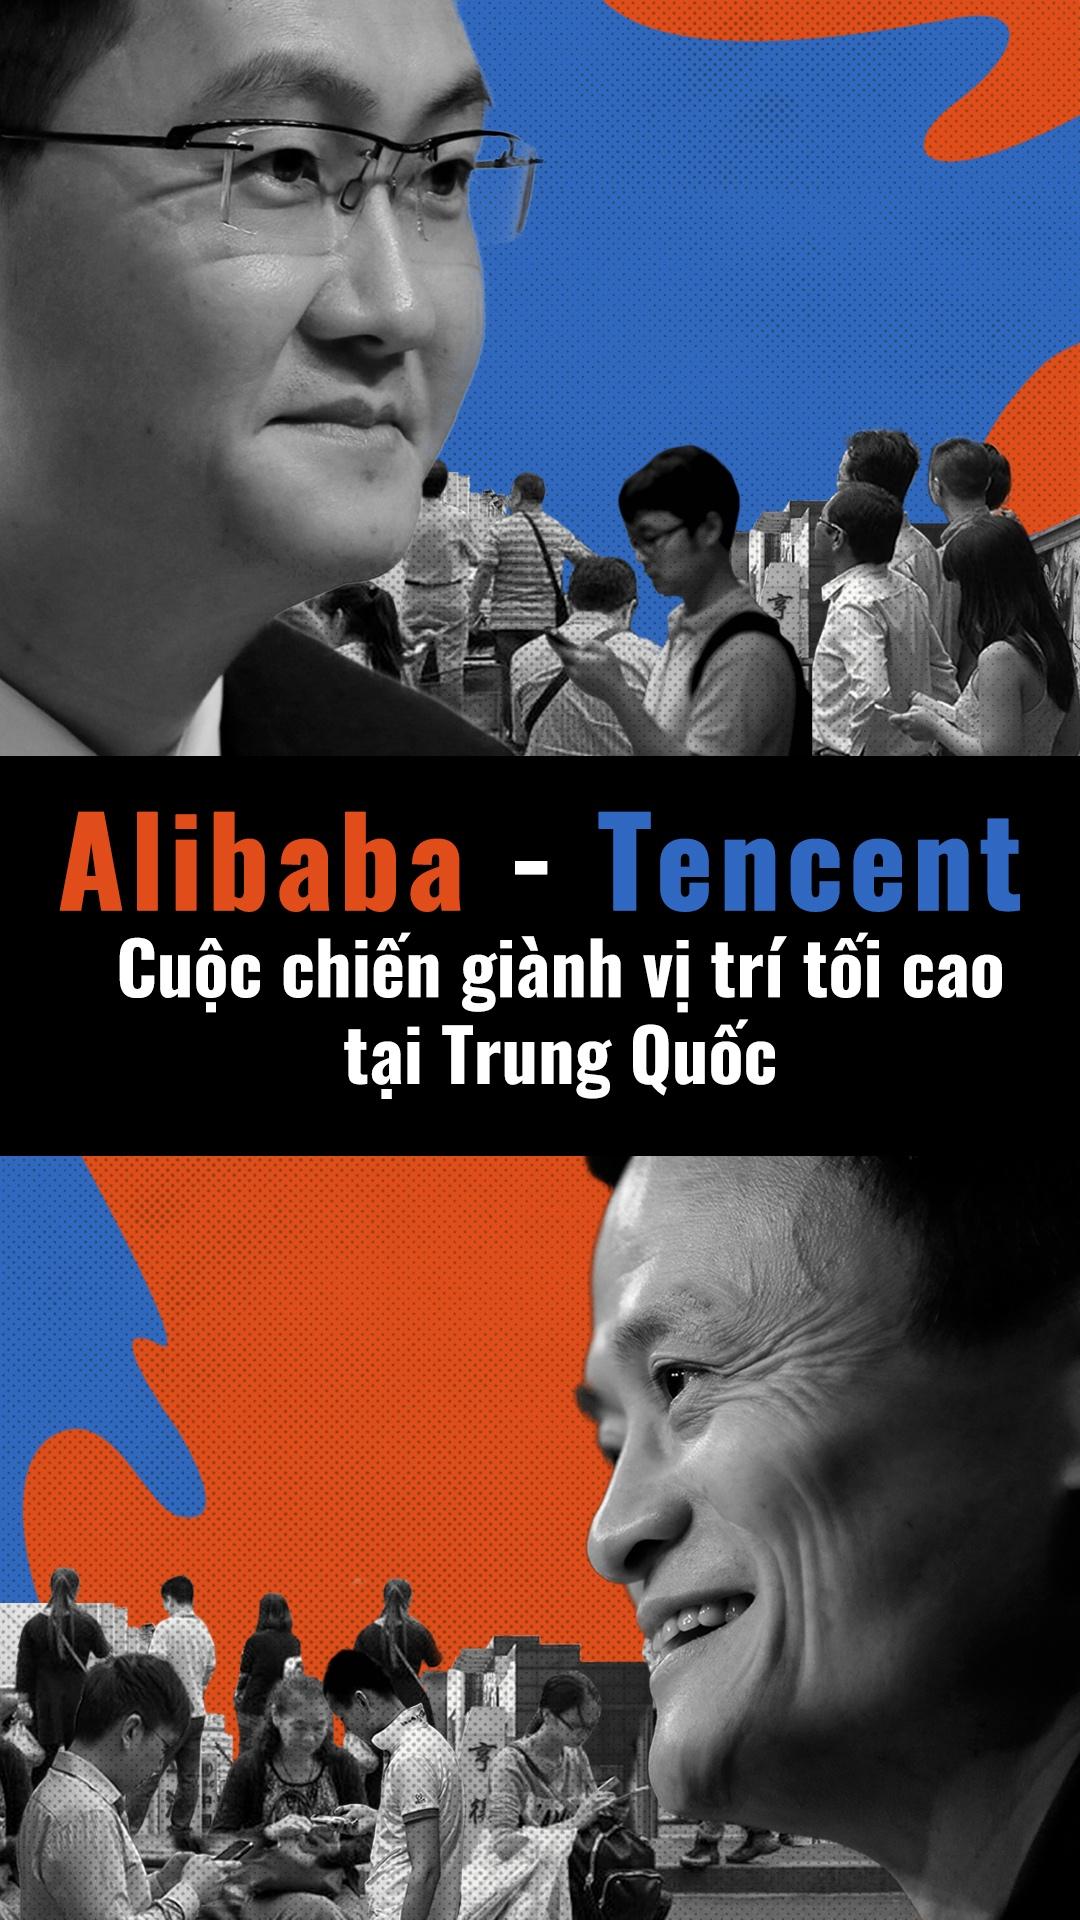 Alibaba dau Tencent - cuoc chien gianh ngoi vuong tai Trung Quoc hinh anh 1